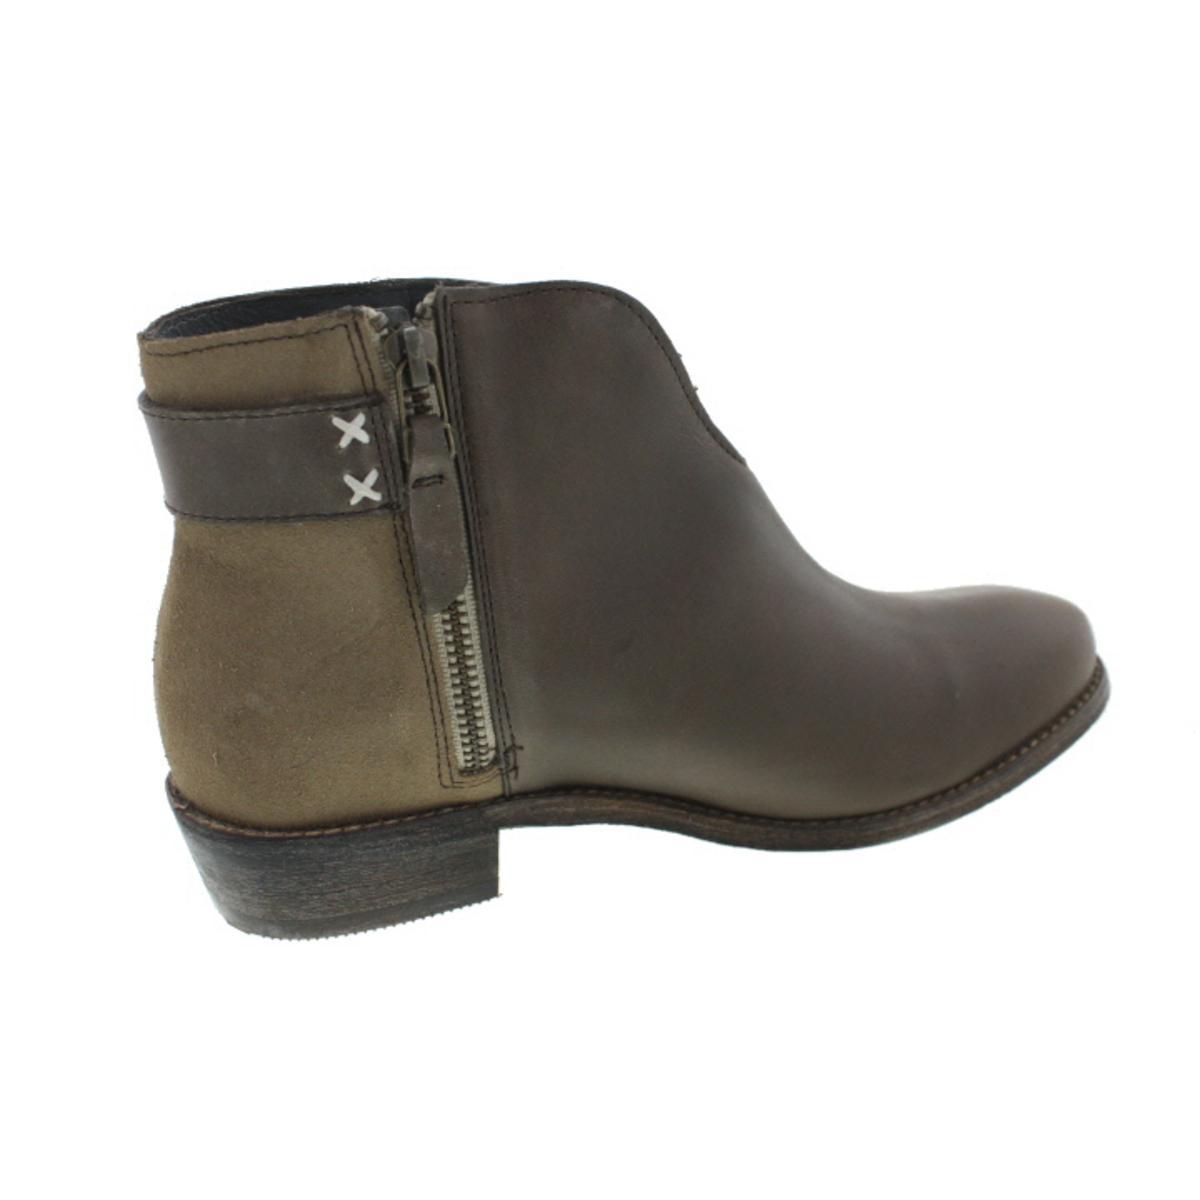 Koolaburra Damenschuhe Dallas Leder Fringe Western Ankle Stiefel Schuhes BHFO 5429